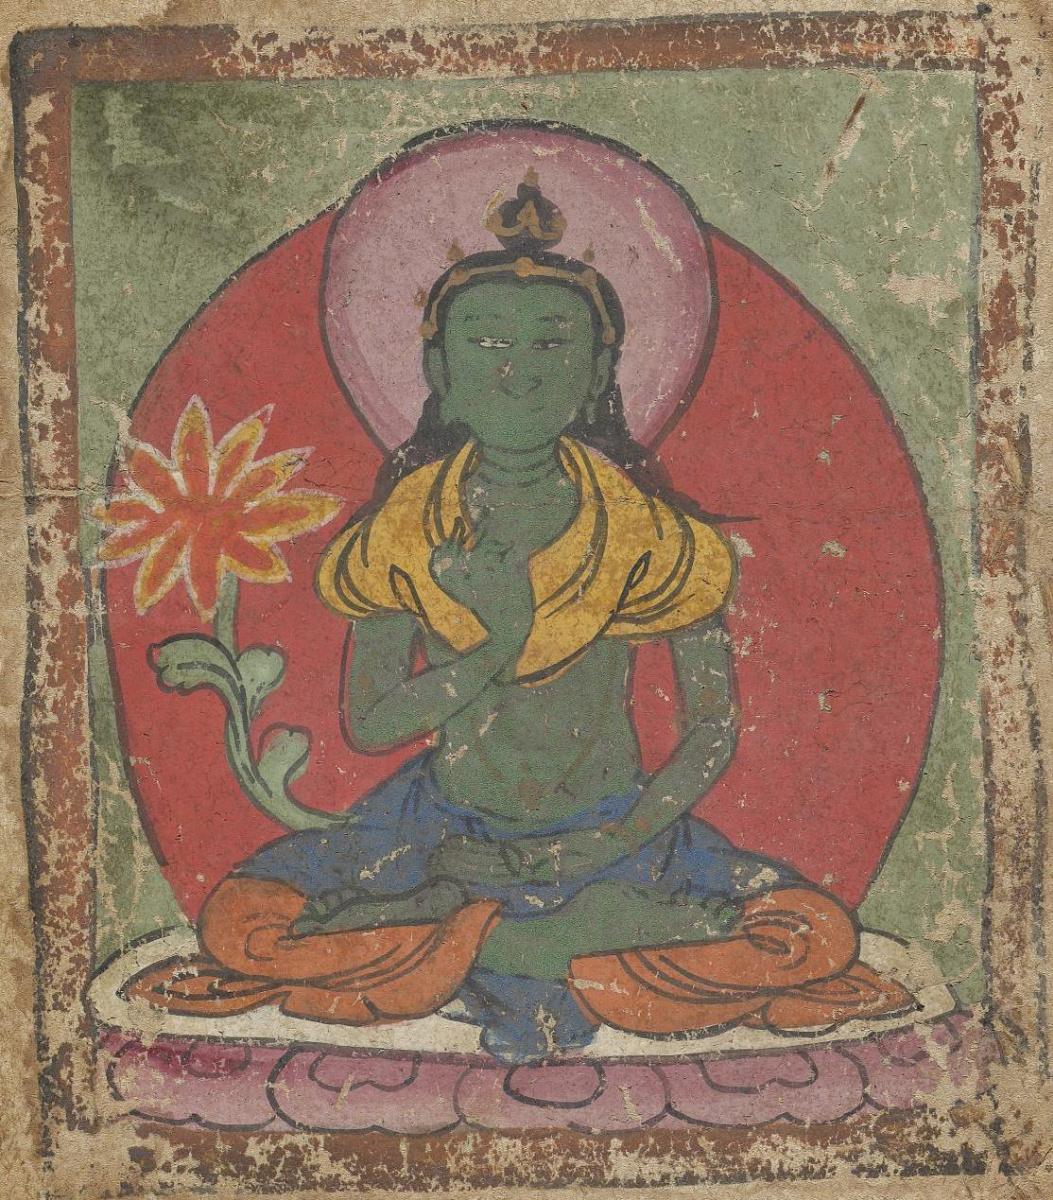 Unknown artist. The deity of the Tibetan Bon religion. Map of 54